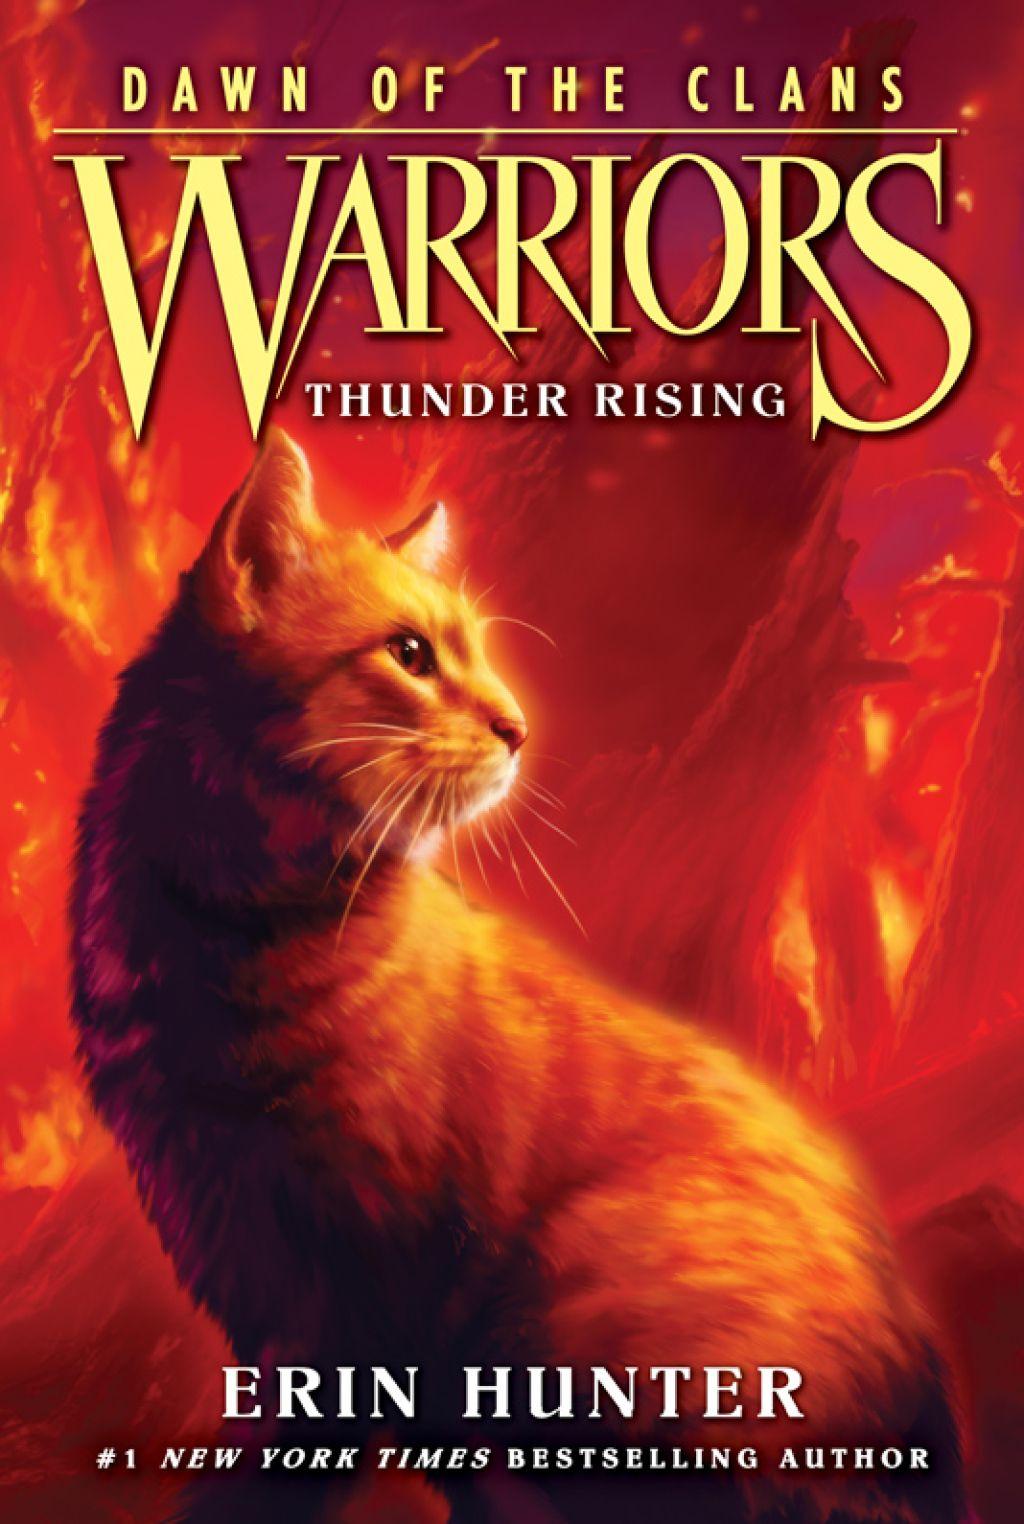 A Rising Thunder Ebook